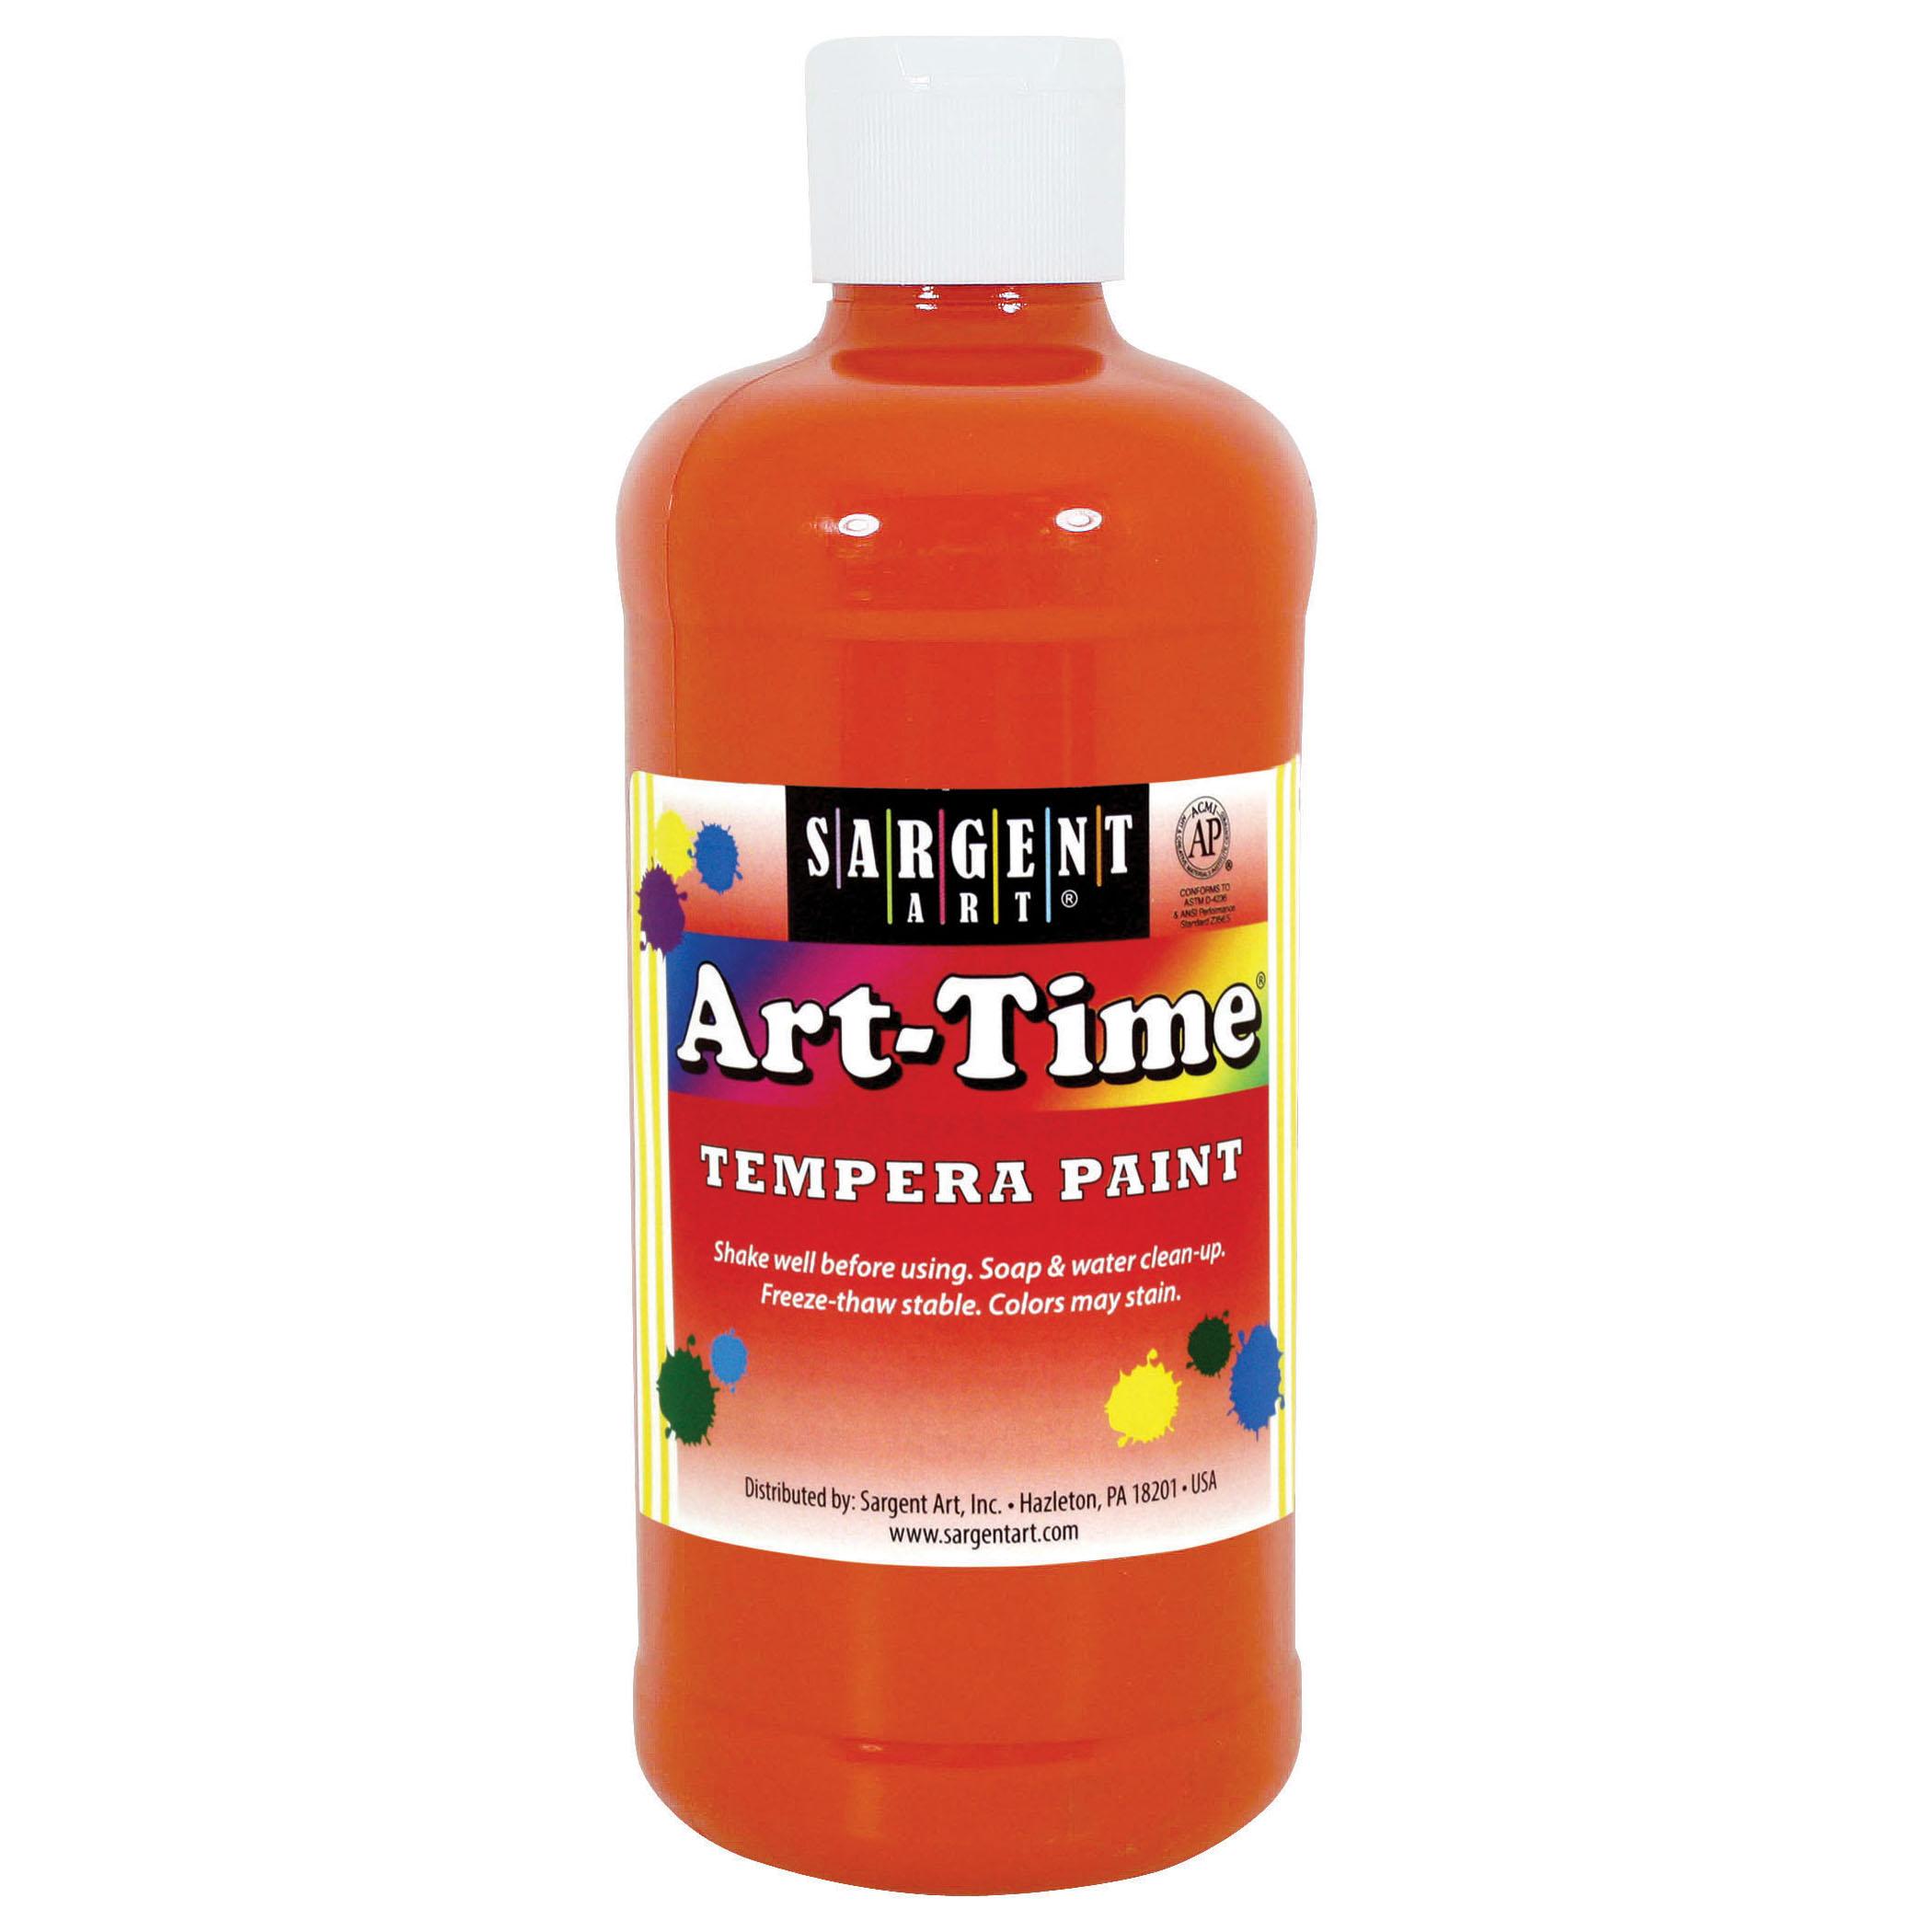 Art-Time® Tempera Paint, Orange - 16 oz., 12/pkg